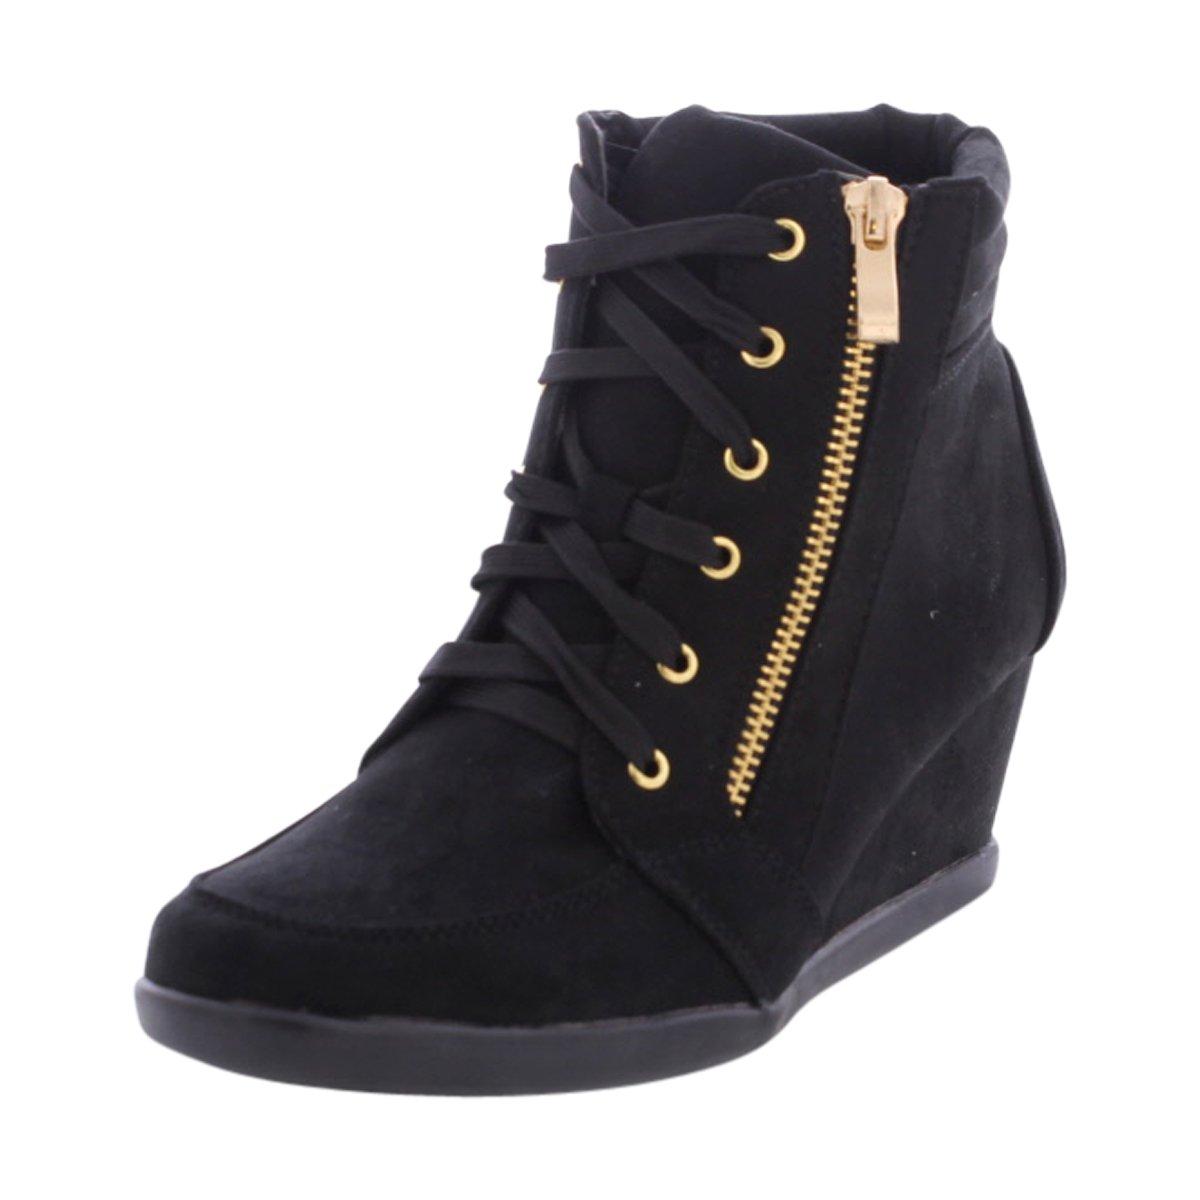 Forever - Women's Gold Side Zipper Wedge Sneakers - Black B01M7OXJTX 8 M US|Black